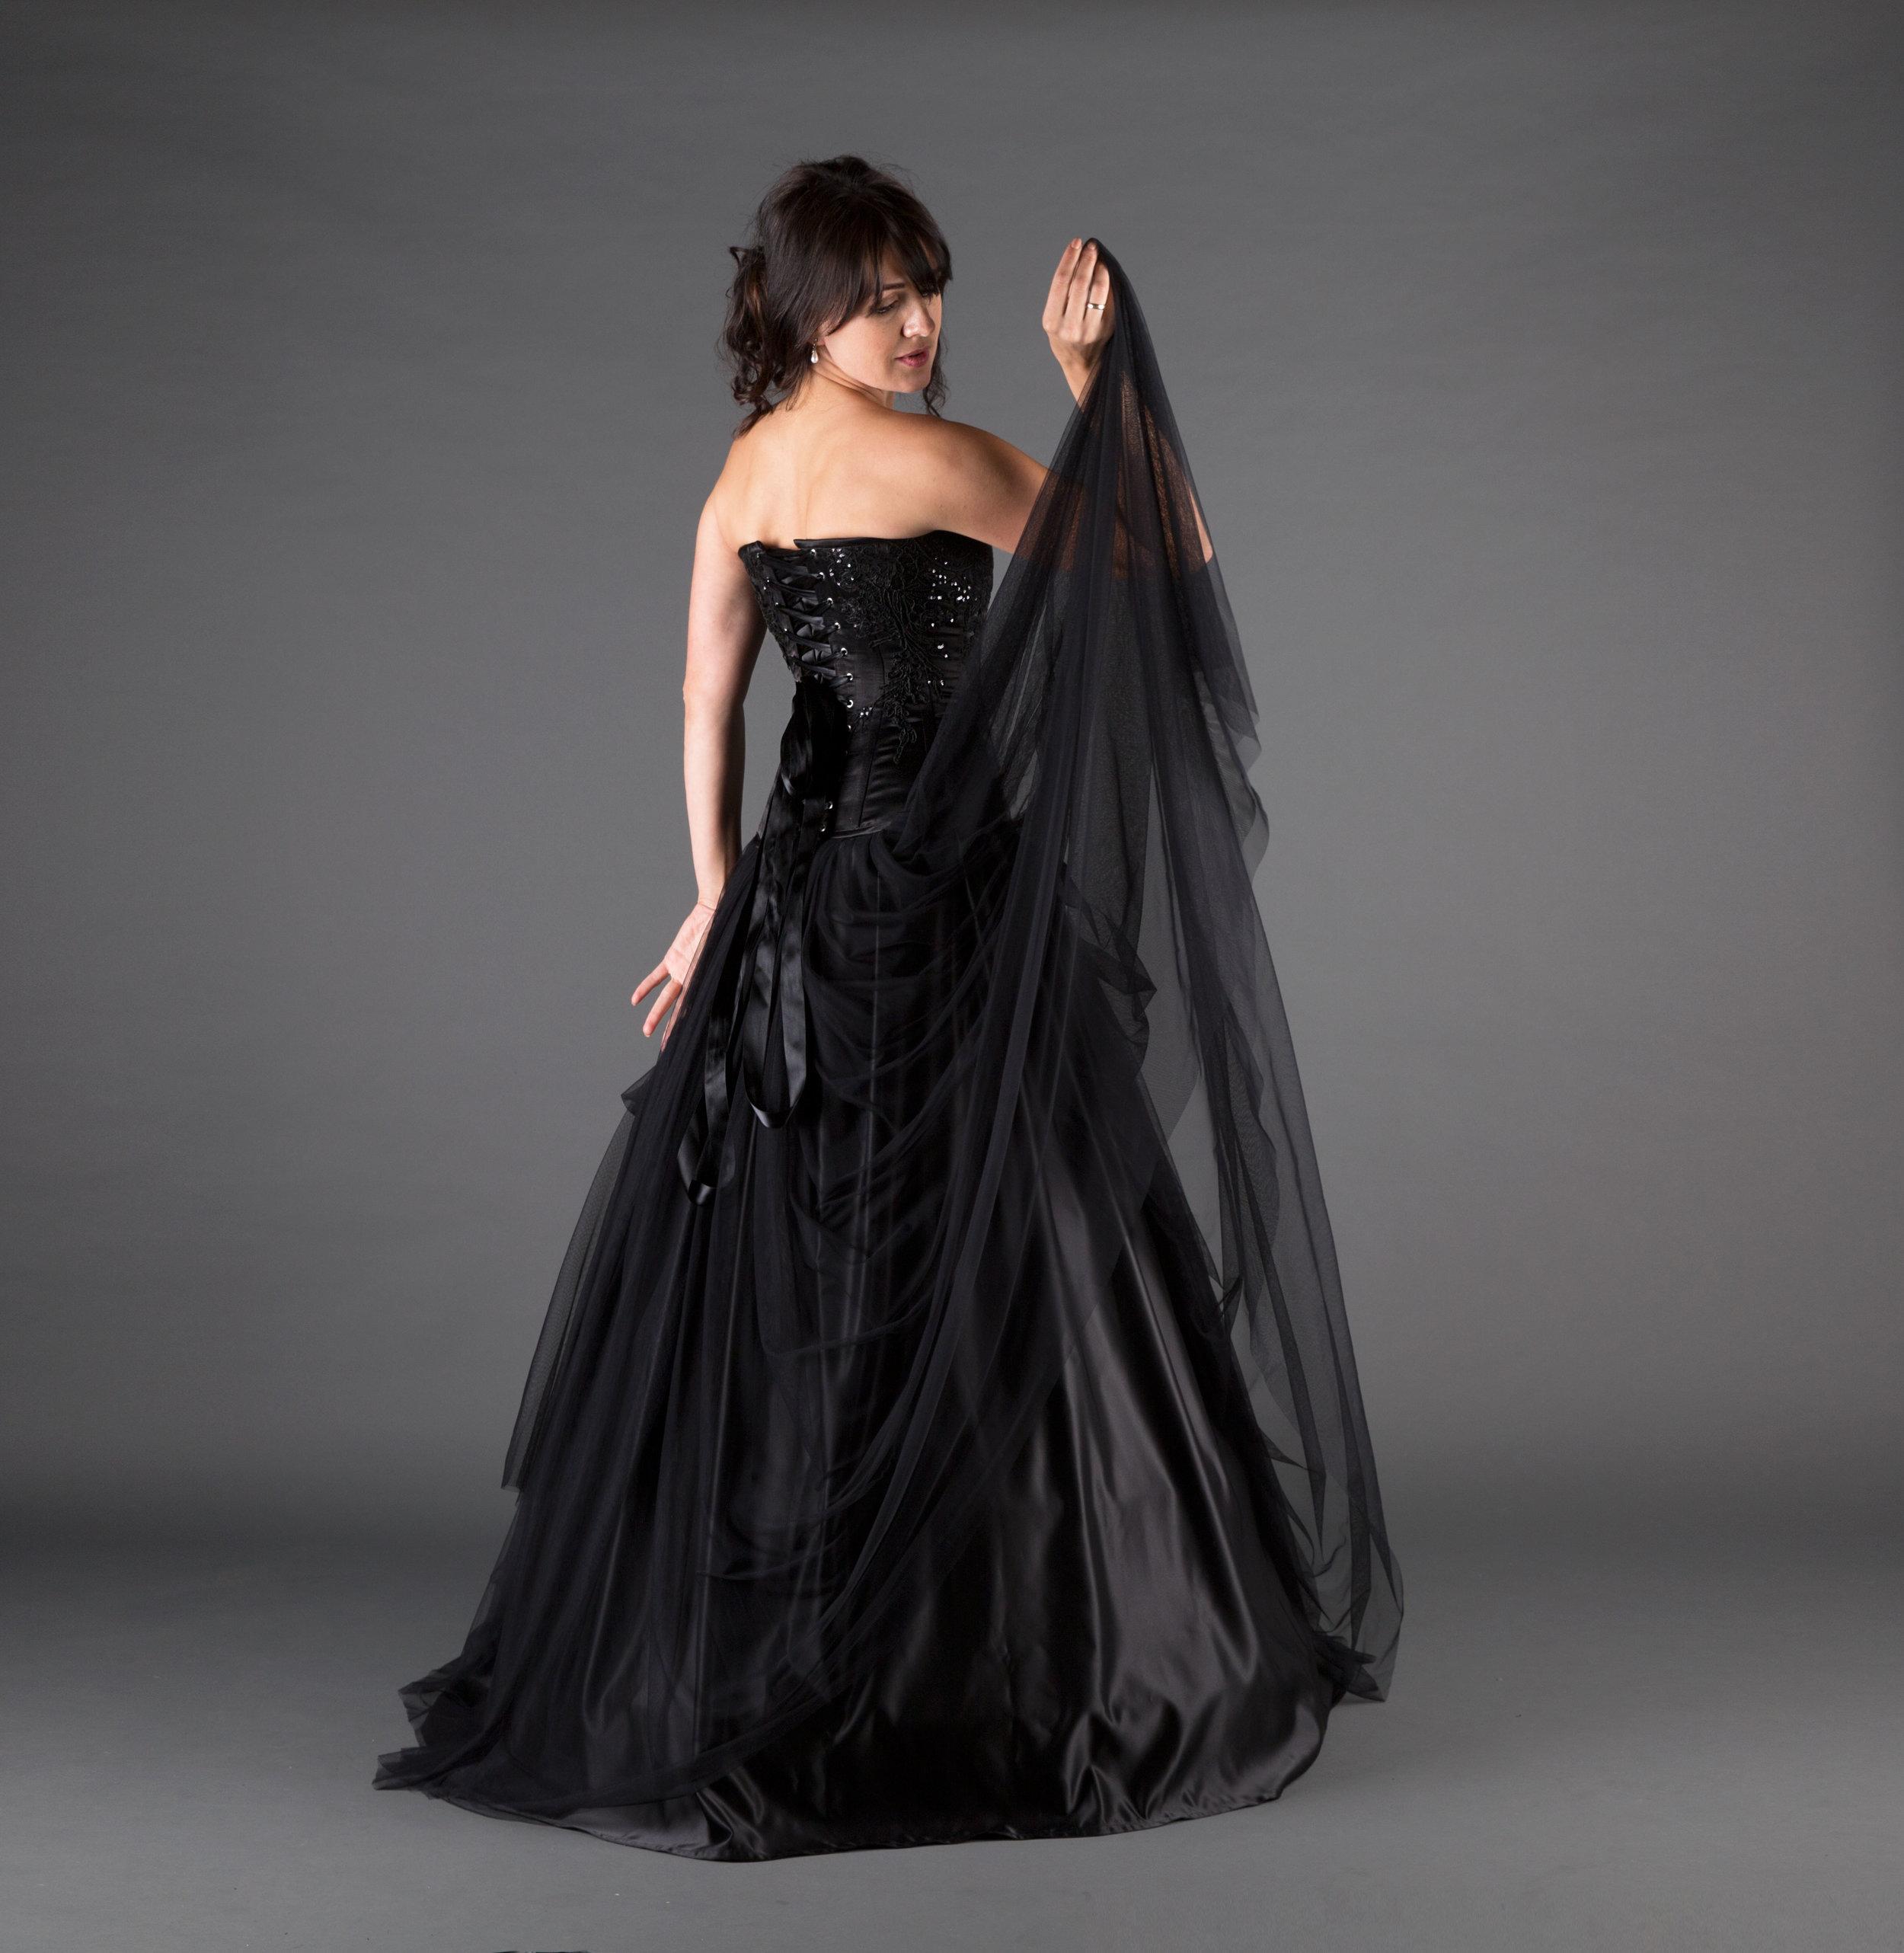 Black Wedding Gown.Queen Black Wedding Dress Ivory Black